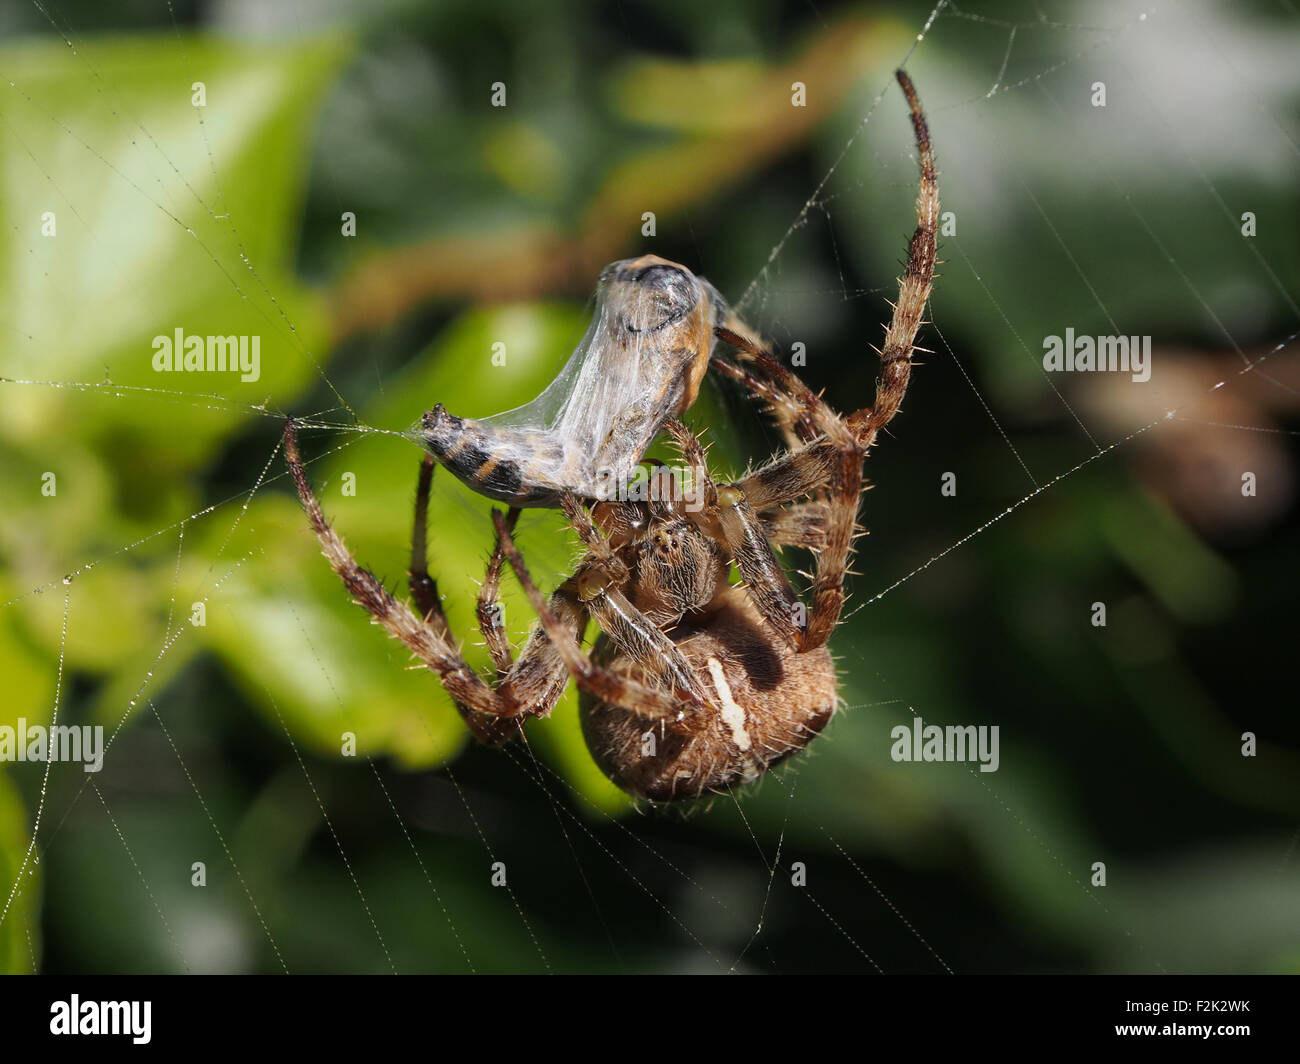 a-garden-spider-araneus-diadematus-wraps-a-hoverfly-in-silk-F2K2WK.jpg